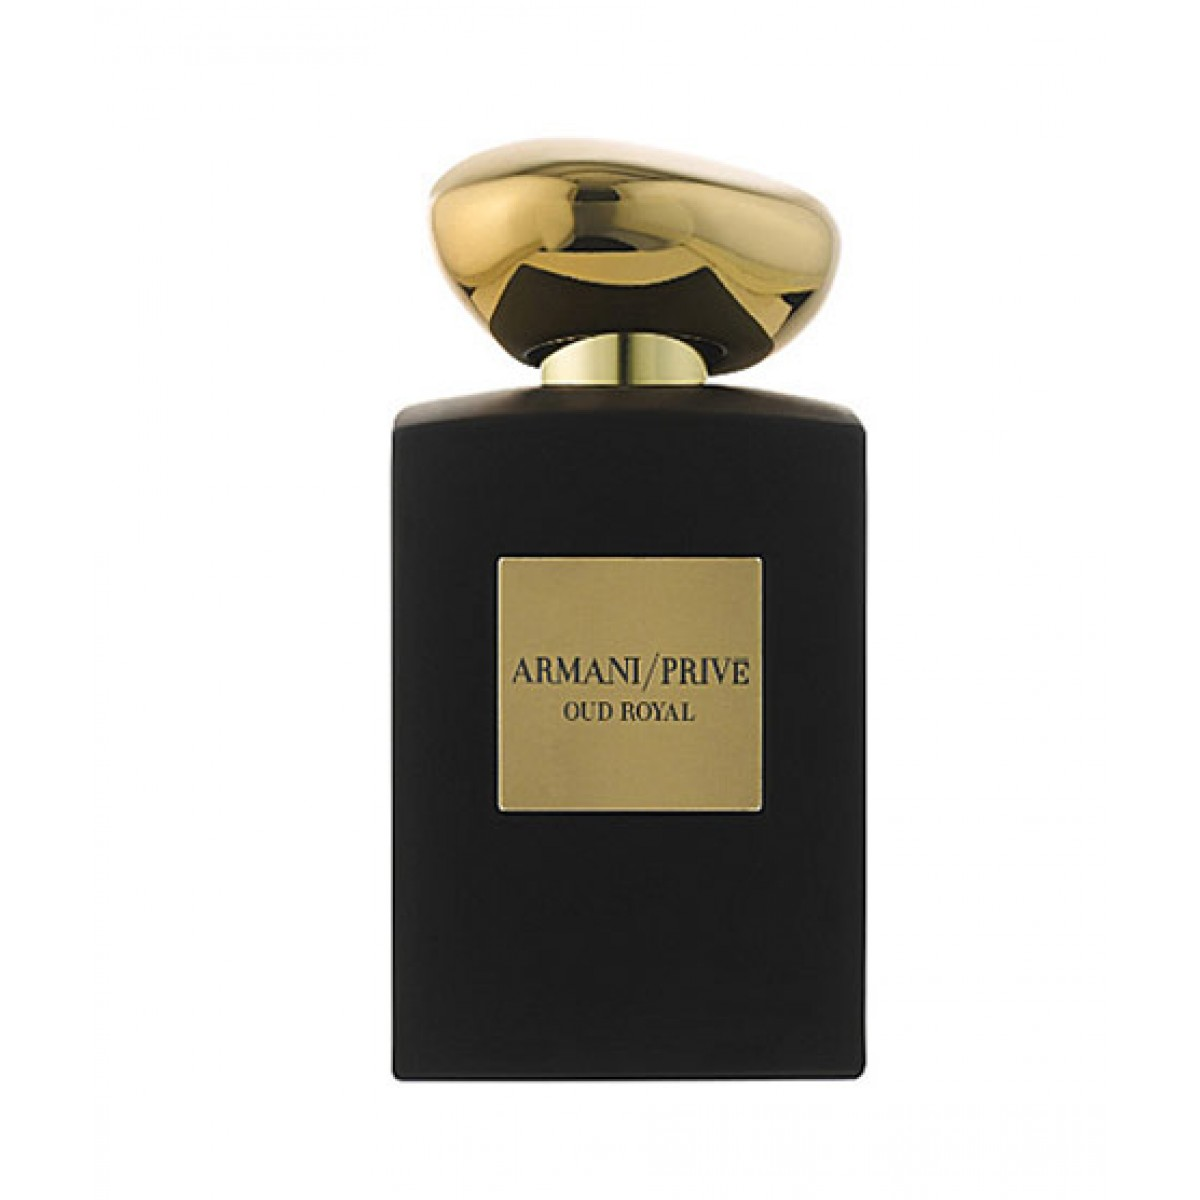 Giorgio Armani Royale Eau De Parfum 100ml Price In Pakistan Buy